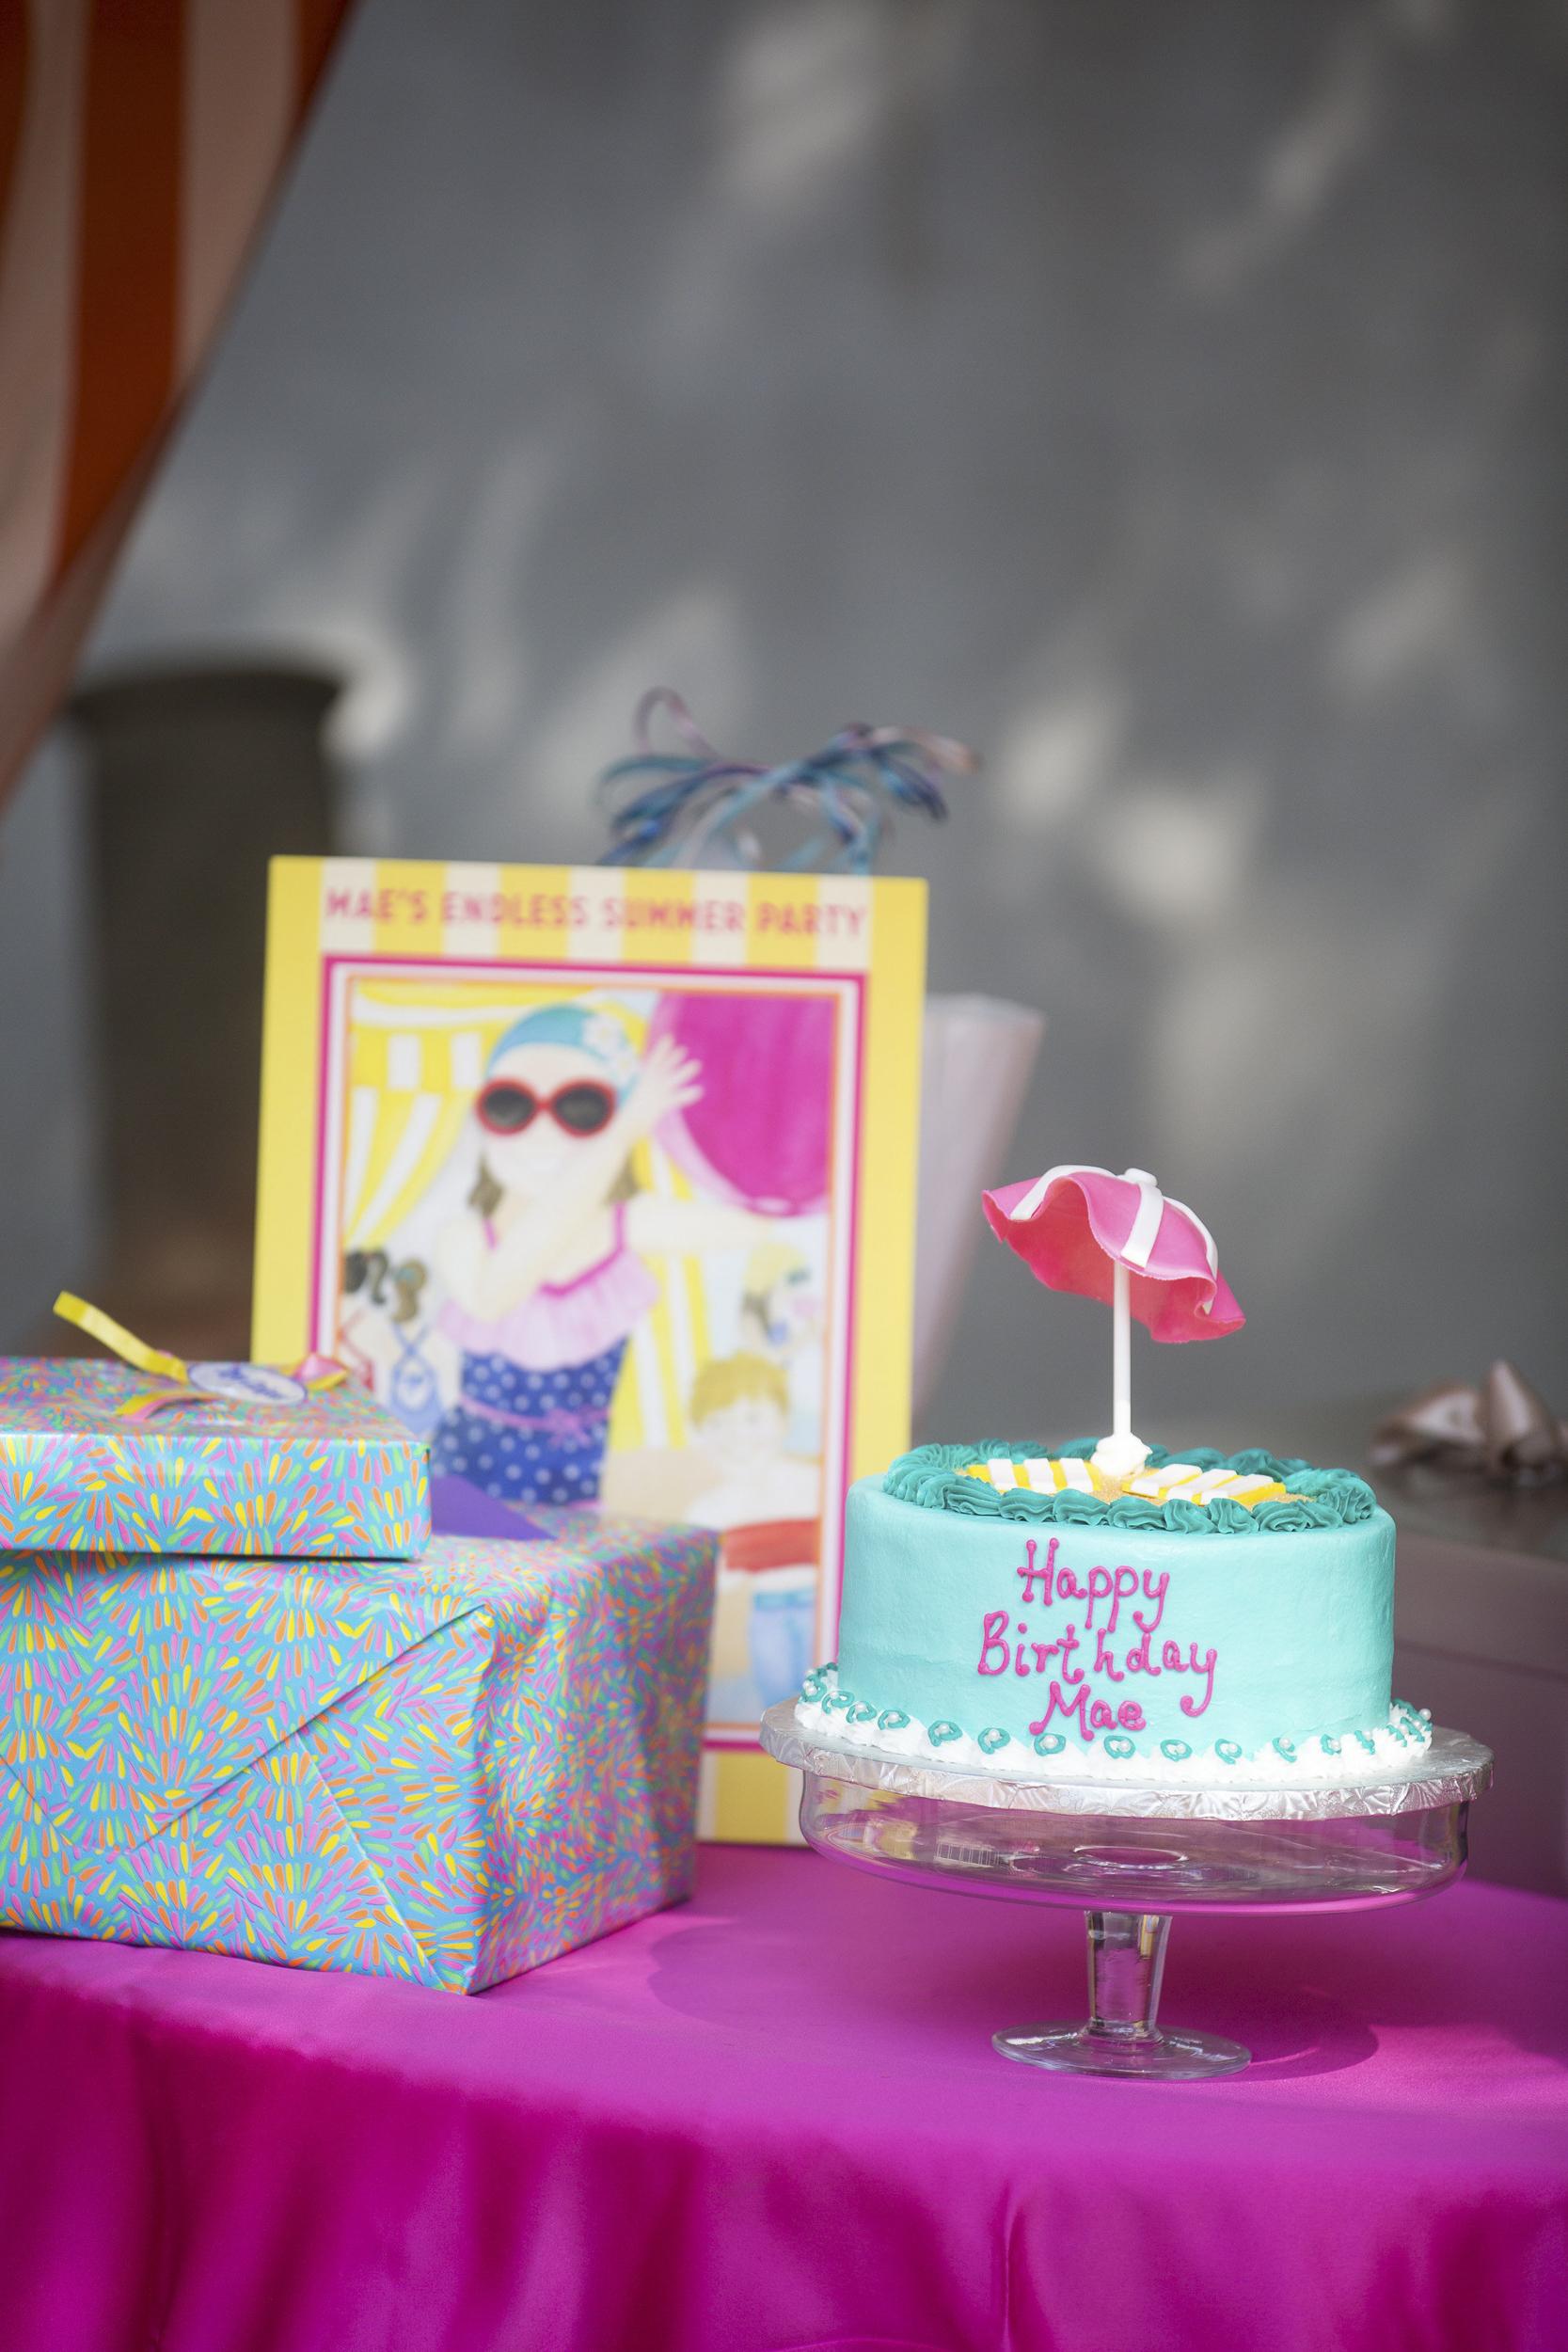 dallas_texas_birthday_party_mae_emily_clarke_events_kids_retro_pool_swim_endless_summer_invitations_ceci_new_york_watercolor_illustration_decor-25.jpg